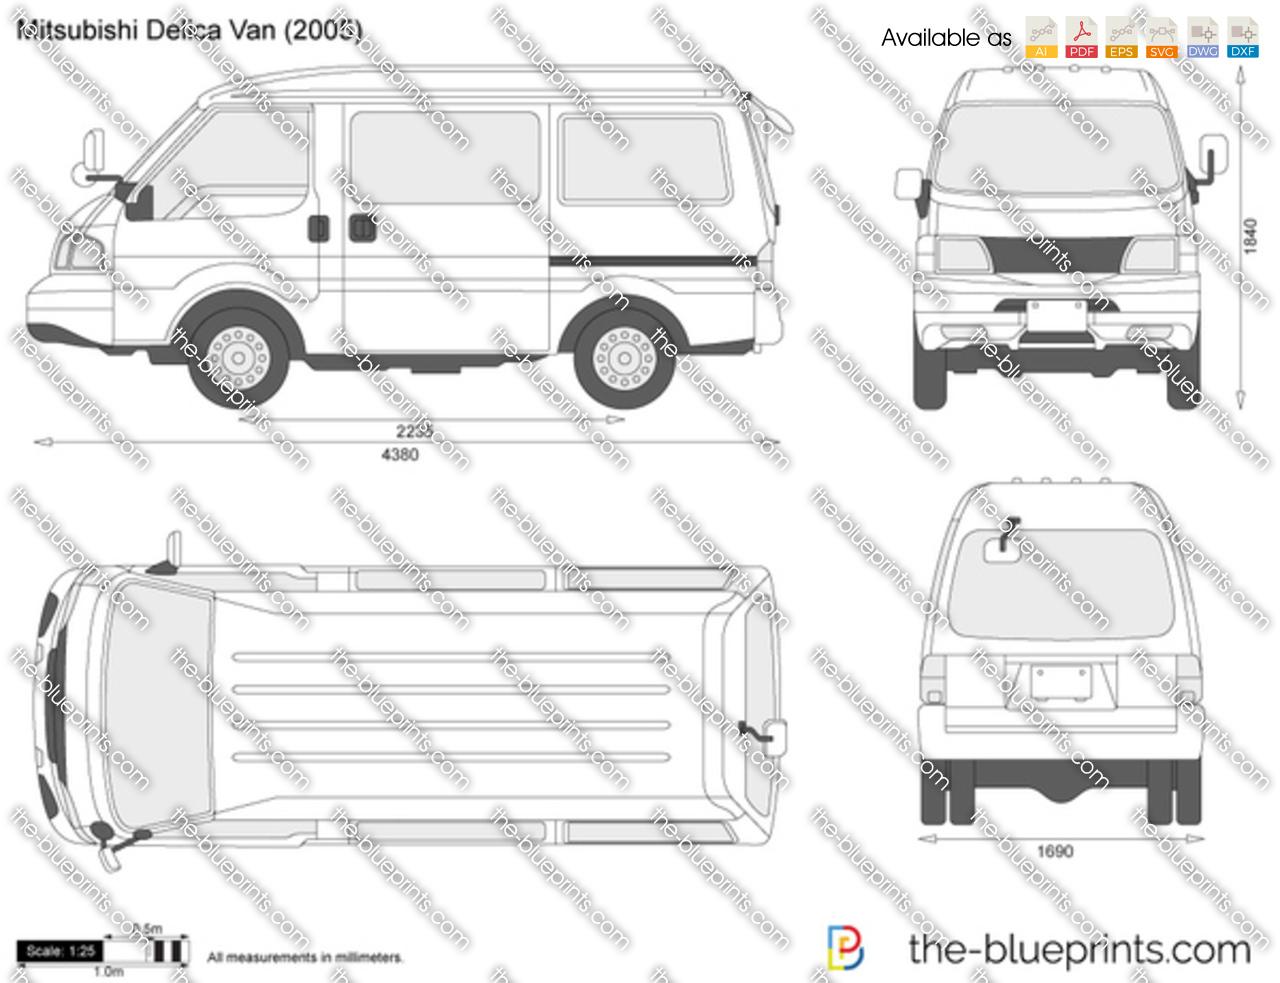 Mitsubishi Delica Van 2000